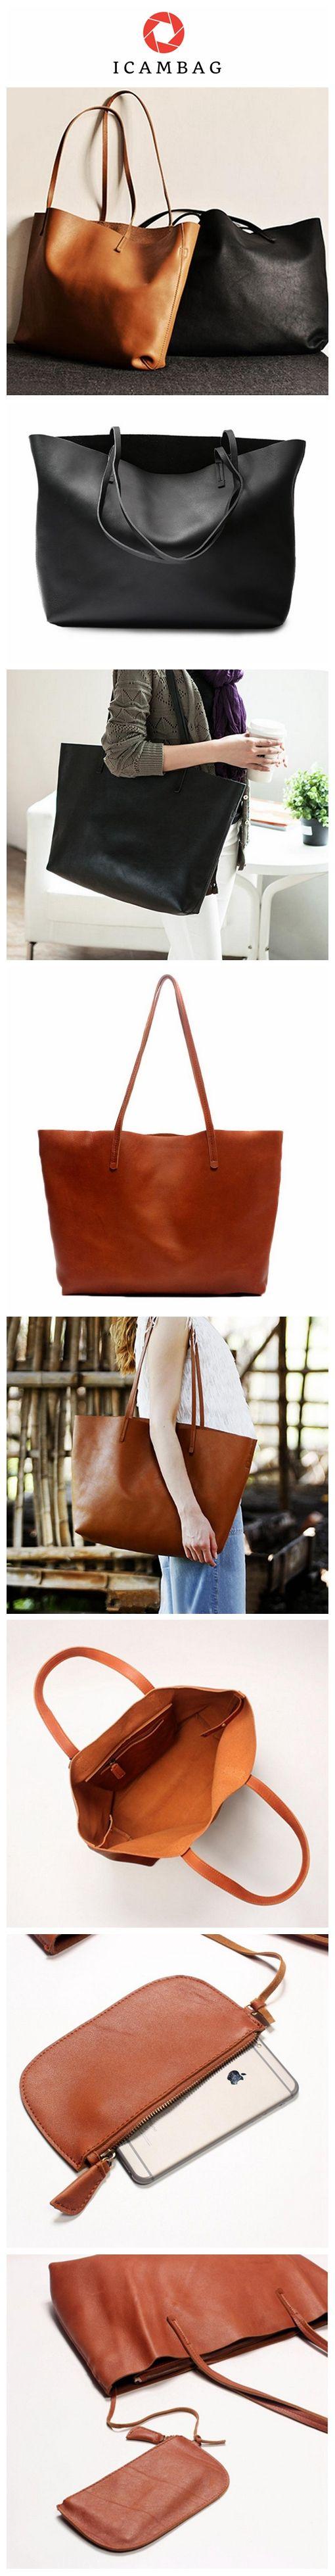 Handmade Modern Fashion Genuine Leather Big Large Tote Bag Handbag For Women Leather Men's and Women's Shopping Bag